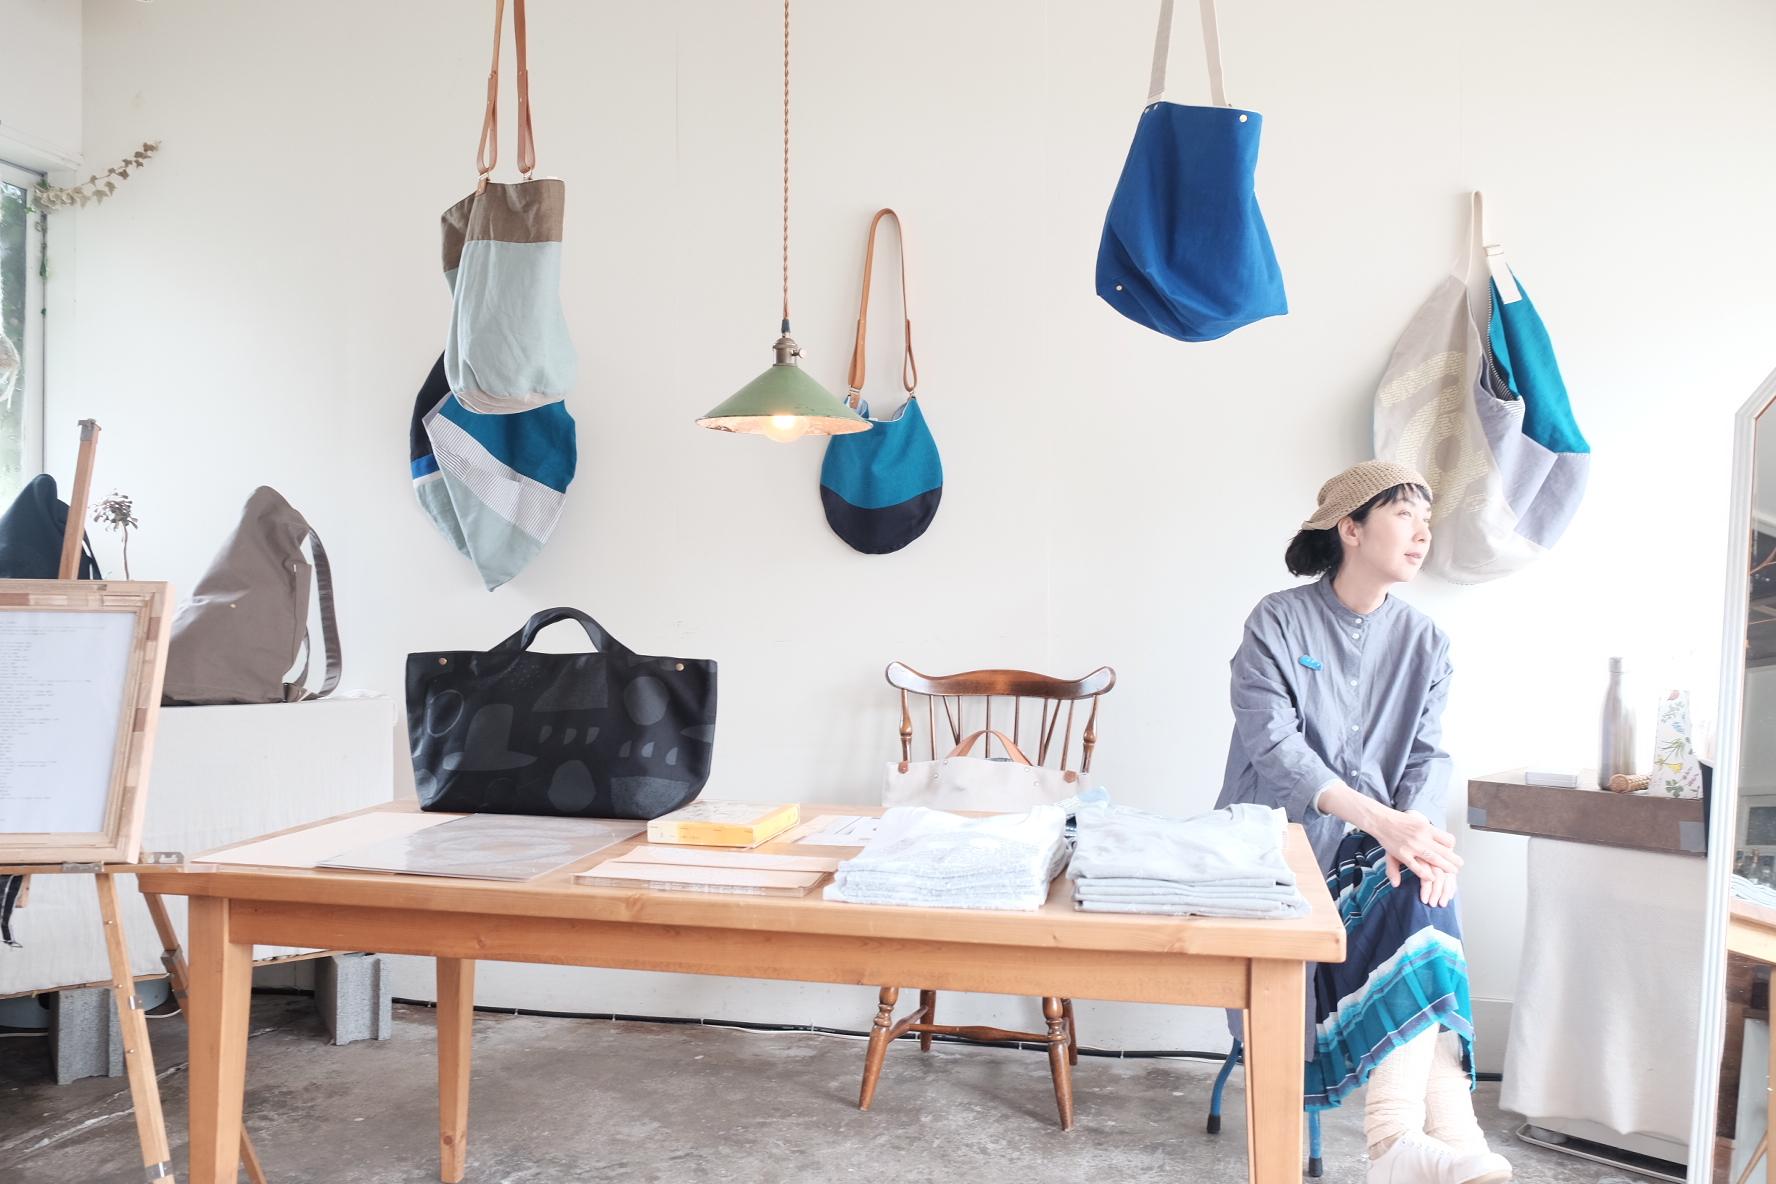 Cotomono Exhibition  オリジナル布のバッグ展